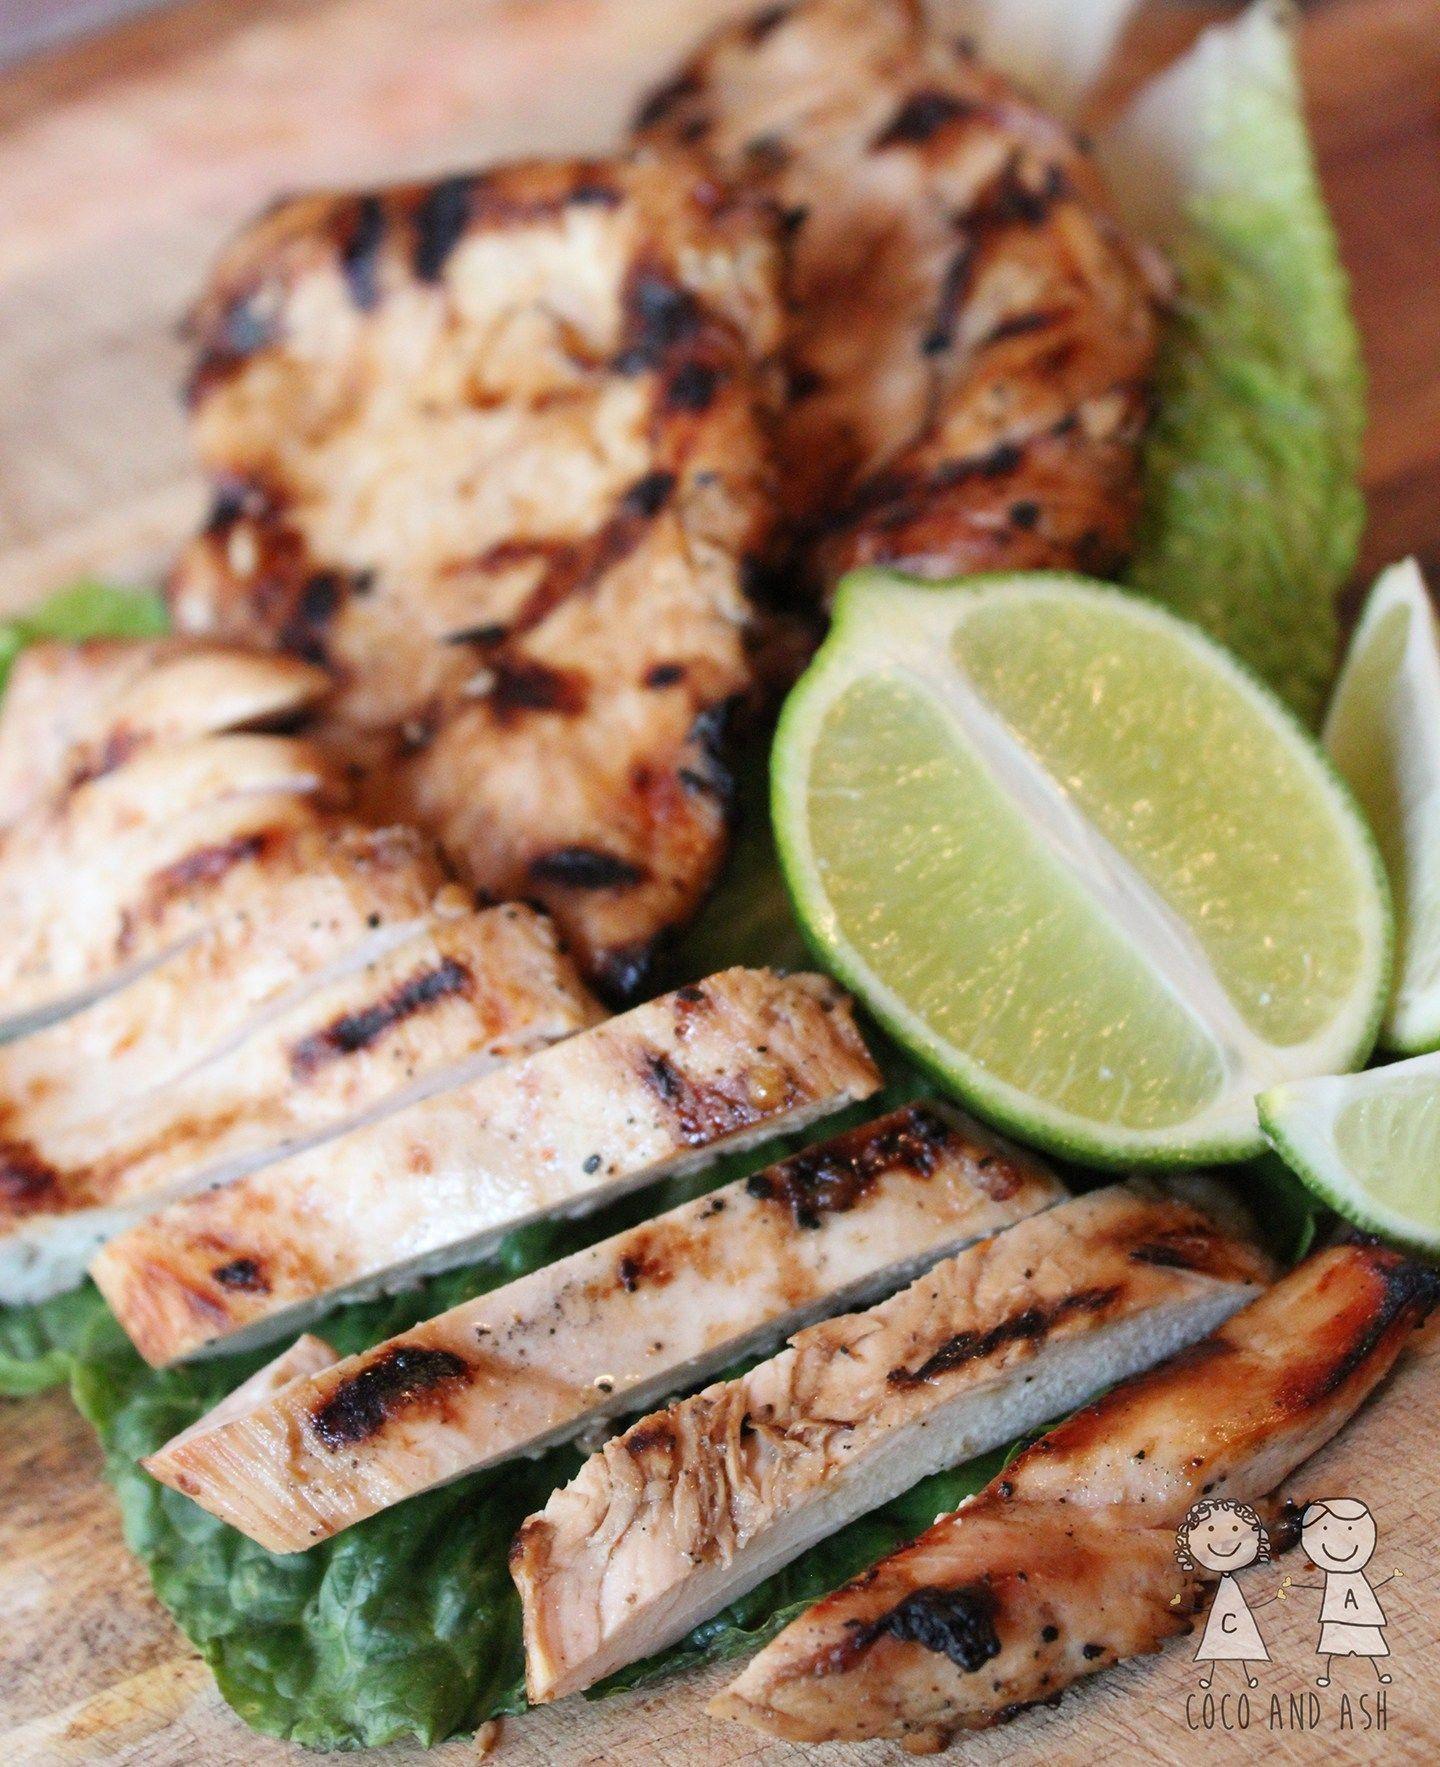 Photo of Soy garlic lime chicken marinade #caponrecipes